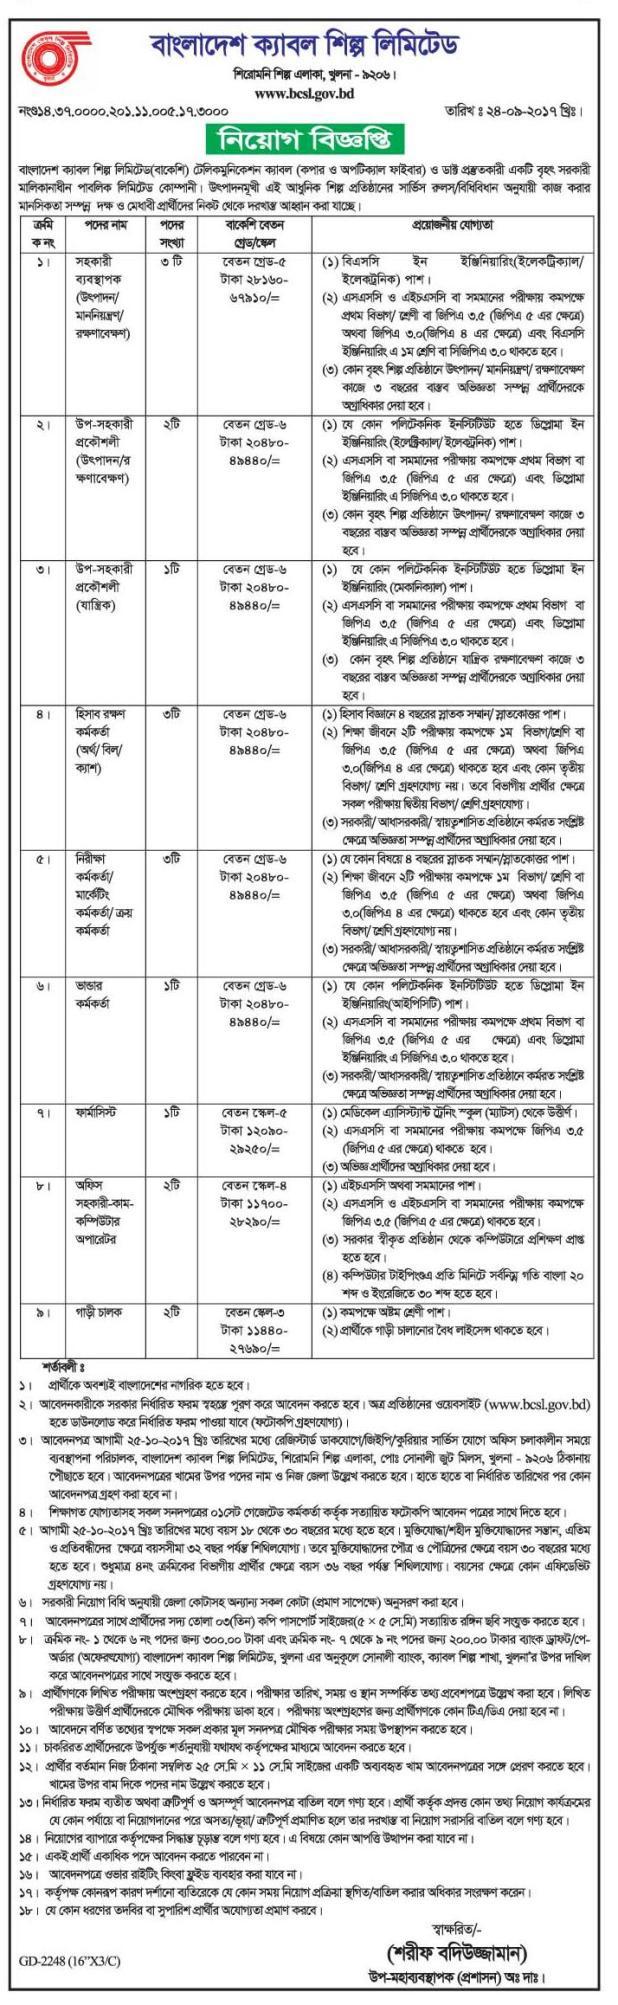 Bangladesh Cable Shilpa Limited Job Circular 2017